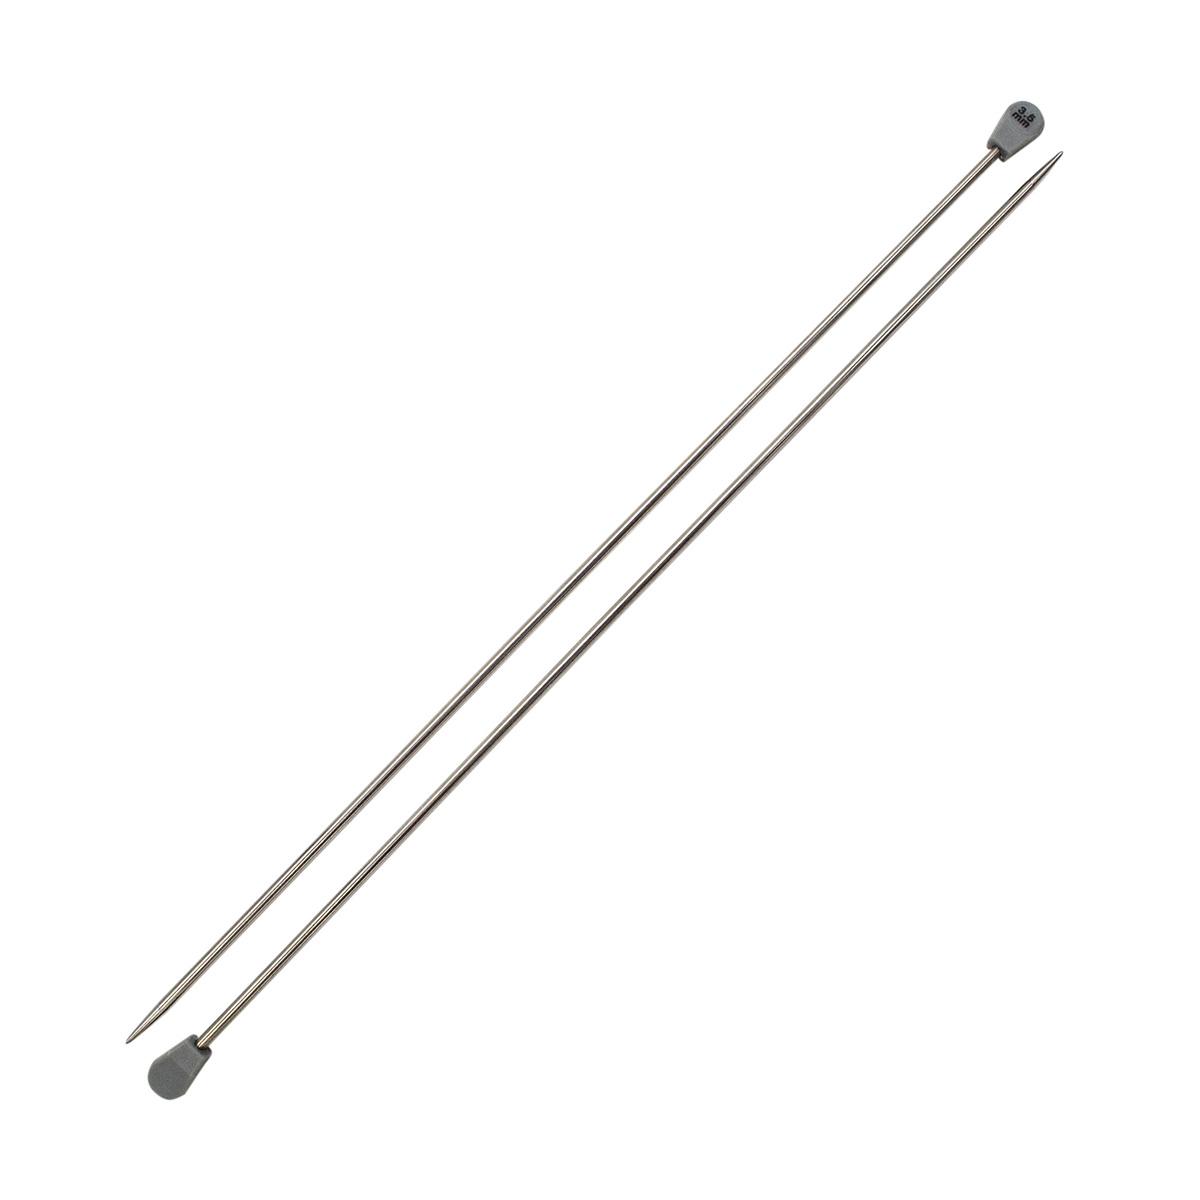 Спицы прямые металл 941235, 35 см, 3,5 мм, Hobby&Pro